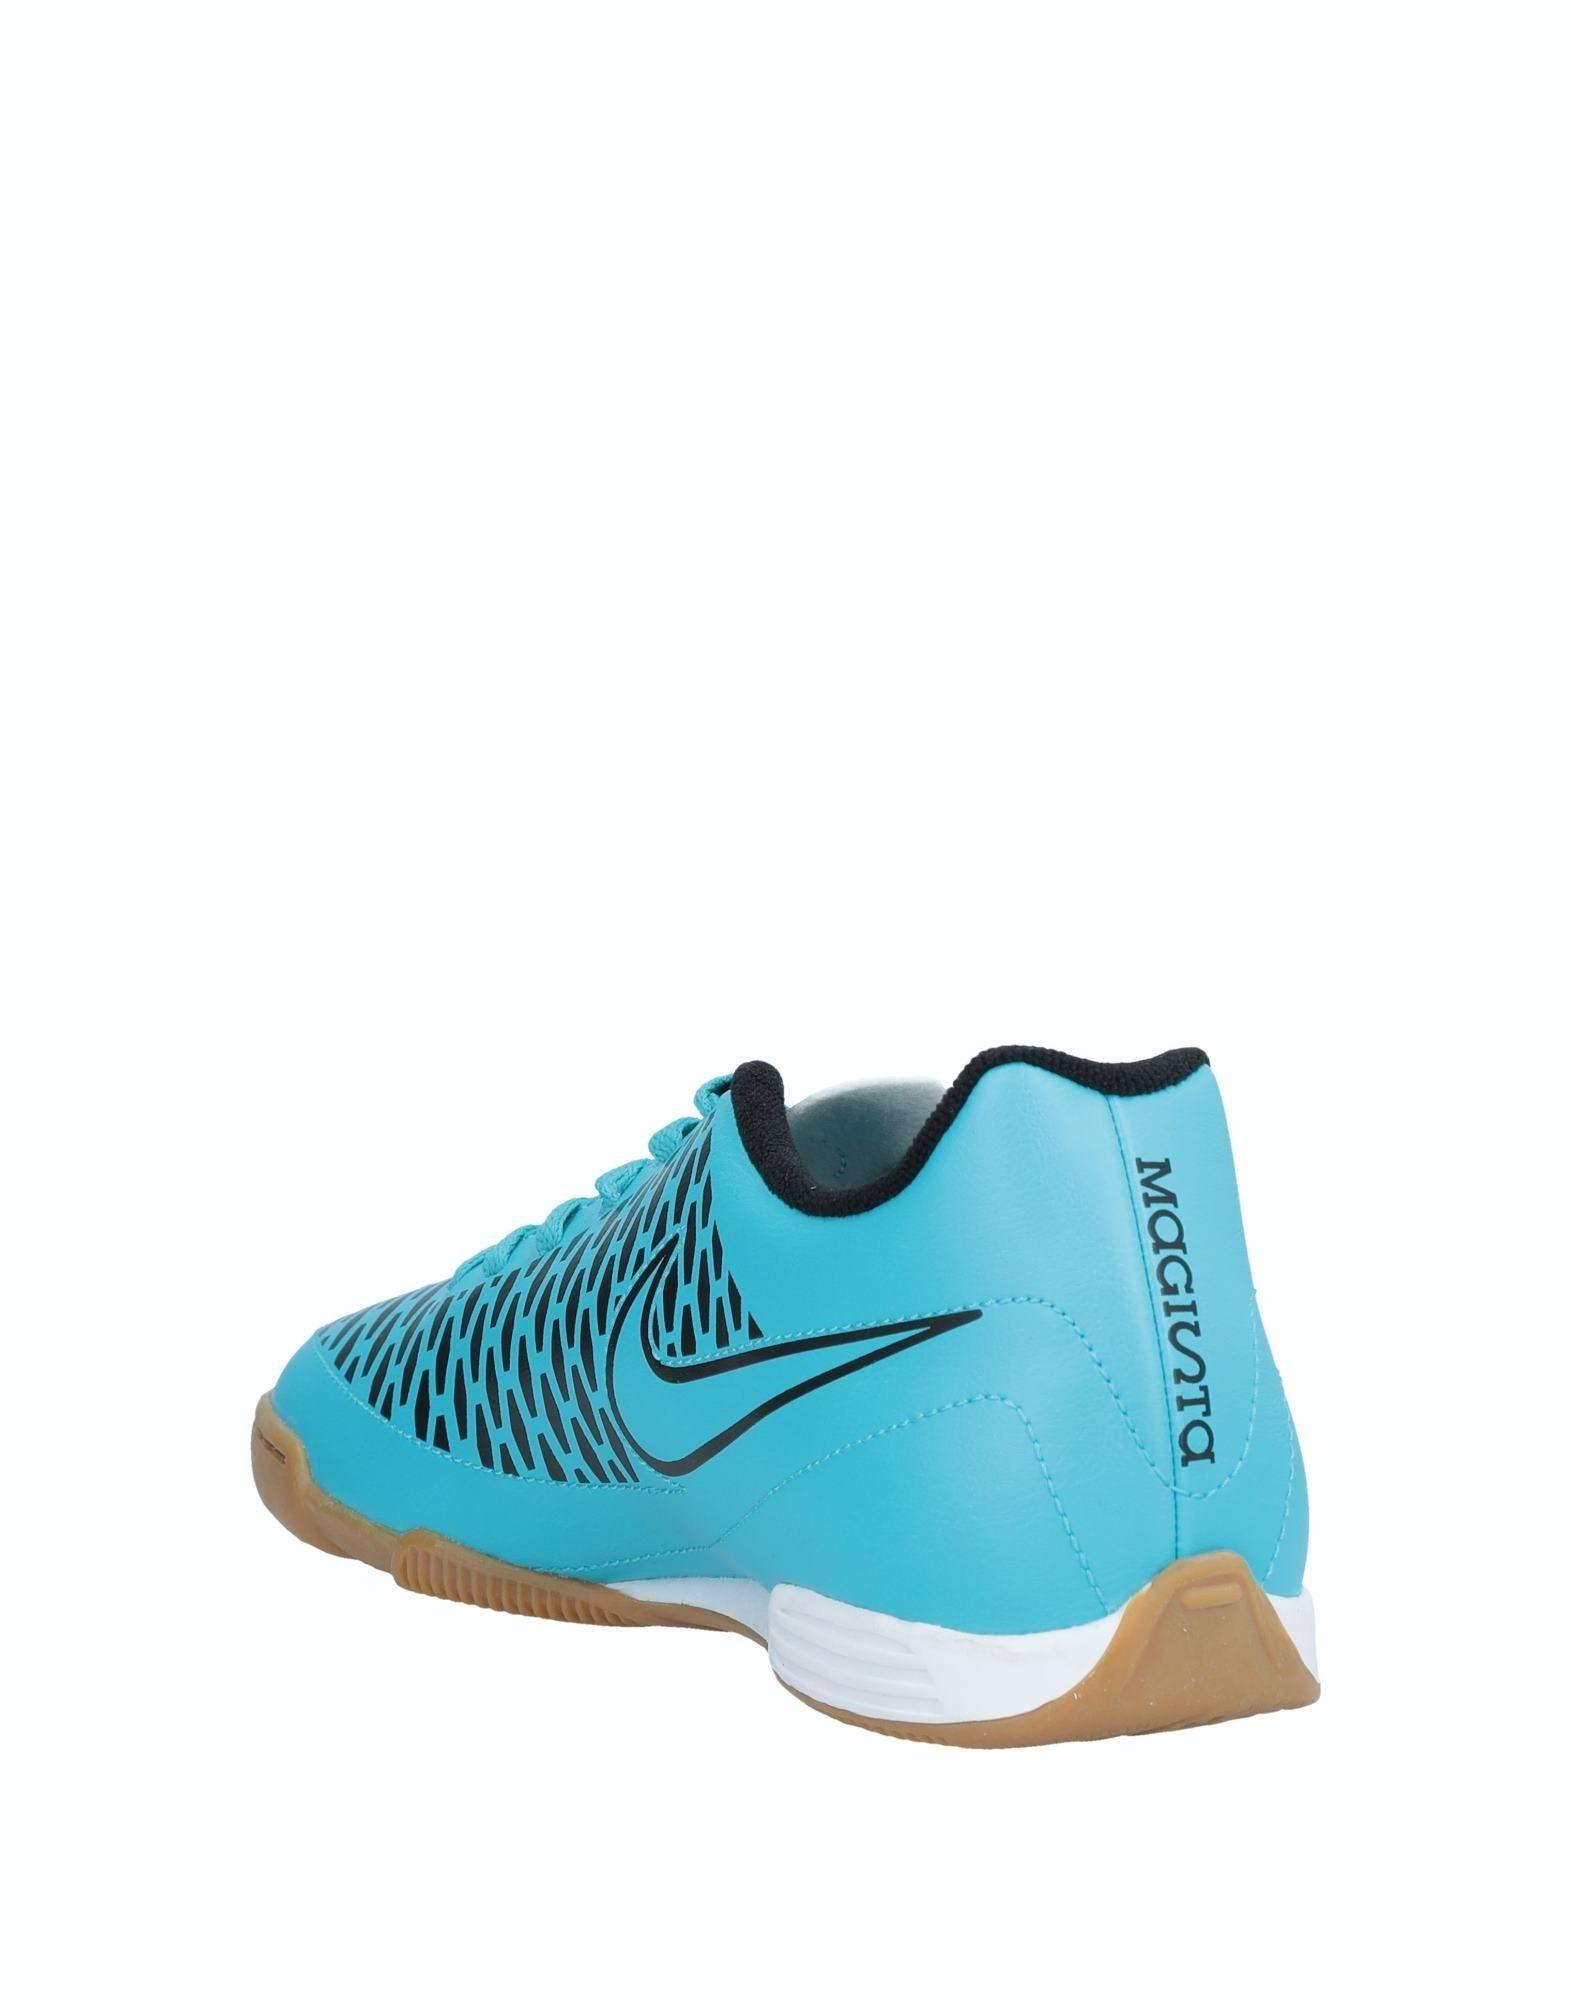 Nike Sneakers Sneakers Sneakers Herren  11538895MP Heiße Schuhe e0d360